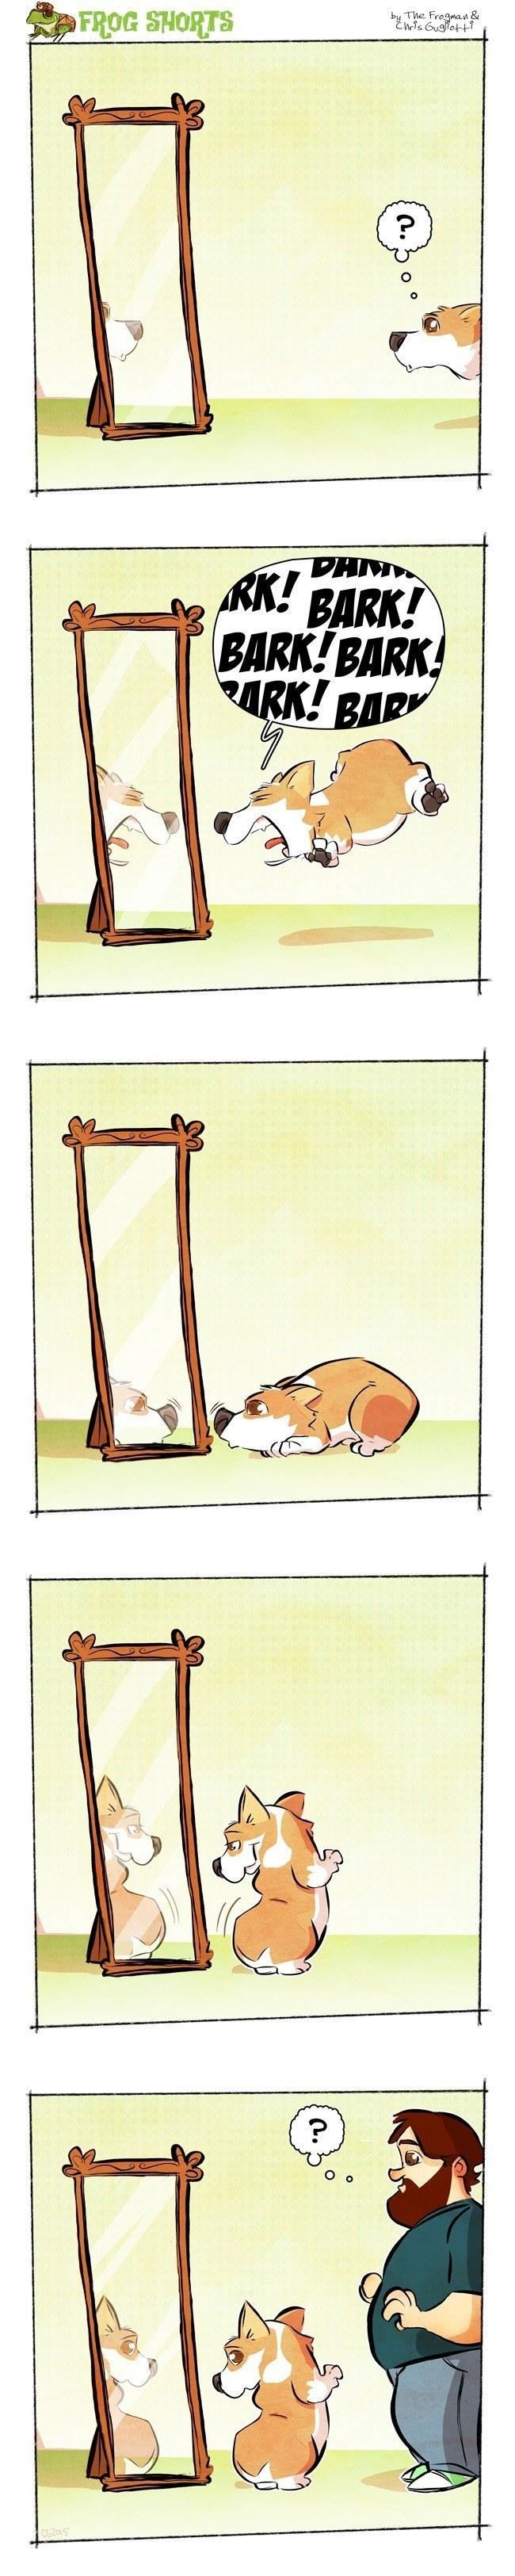 frog-shorts-dog-mirror